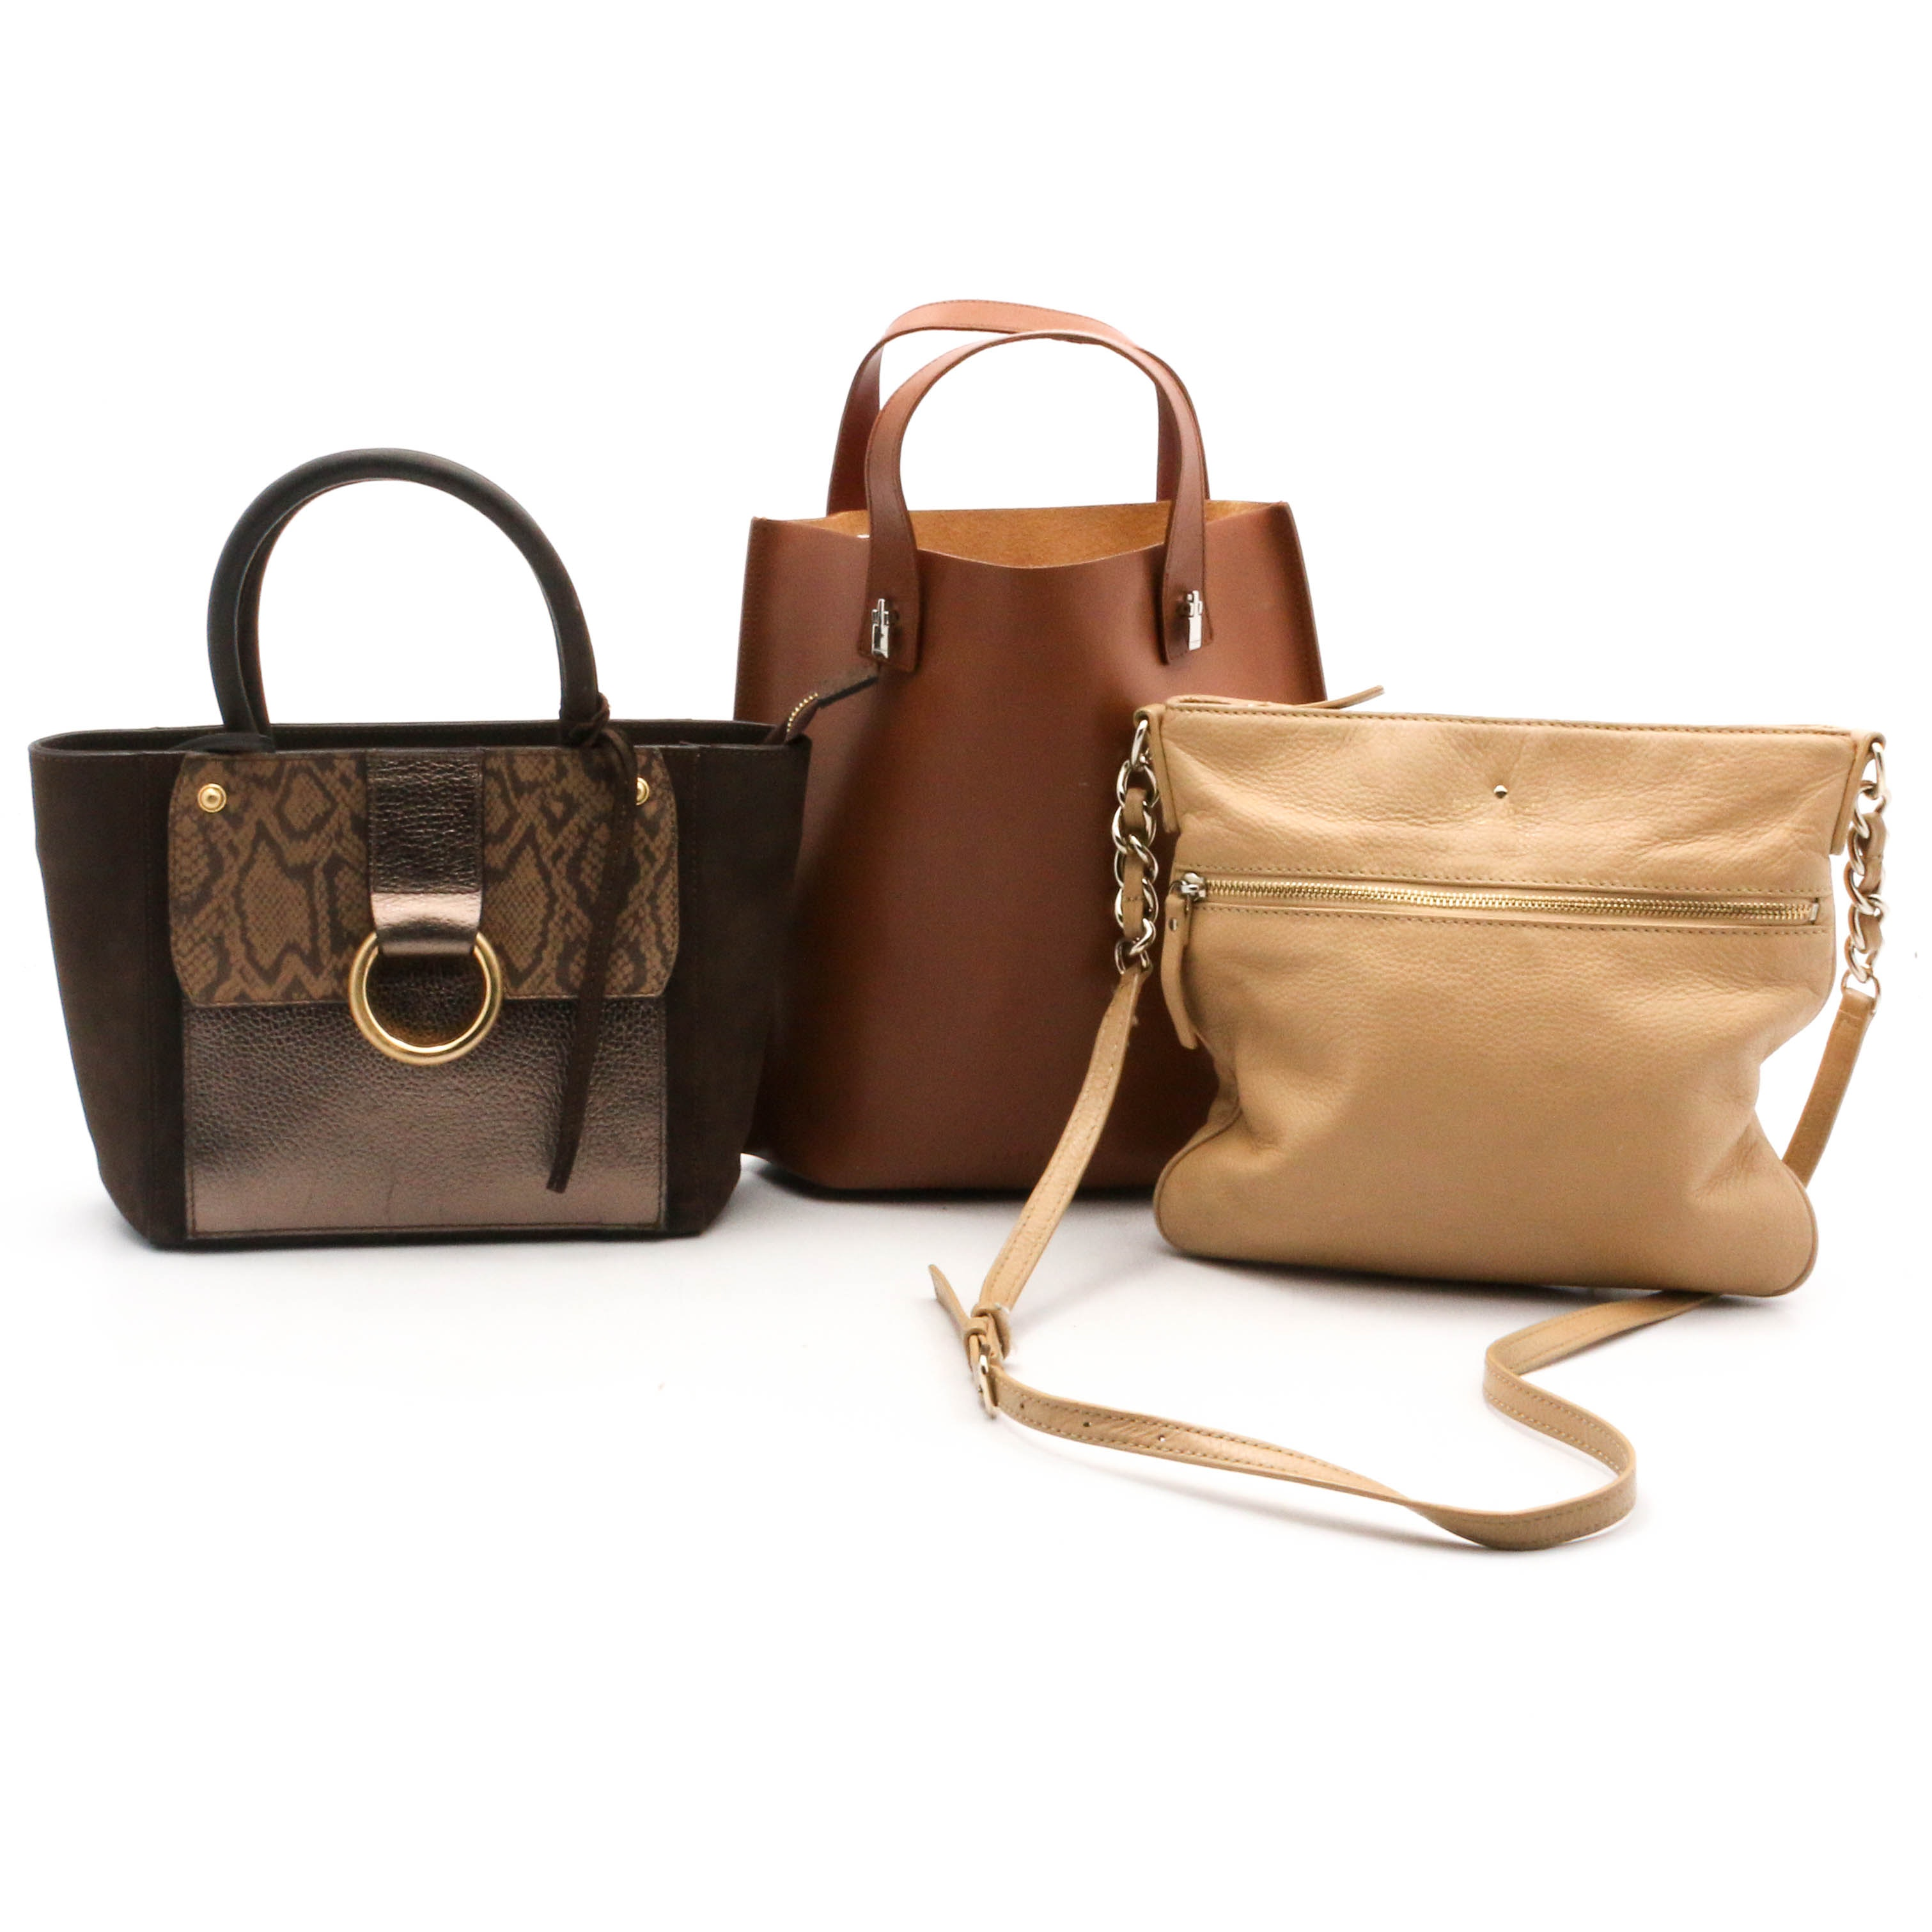 Kate Spade New York, Lamarthe, and Vittoria Napoli Leather Handbags